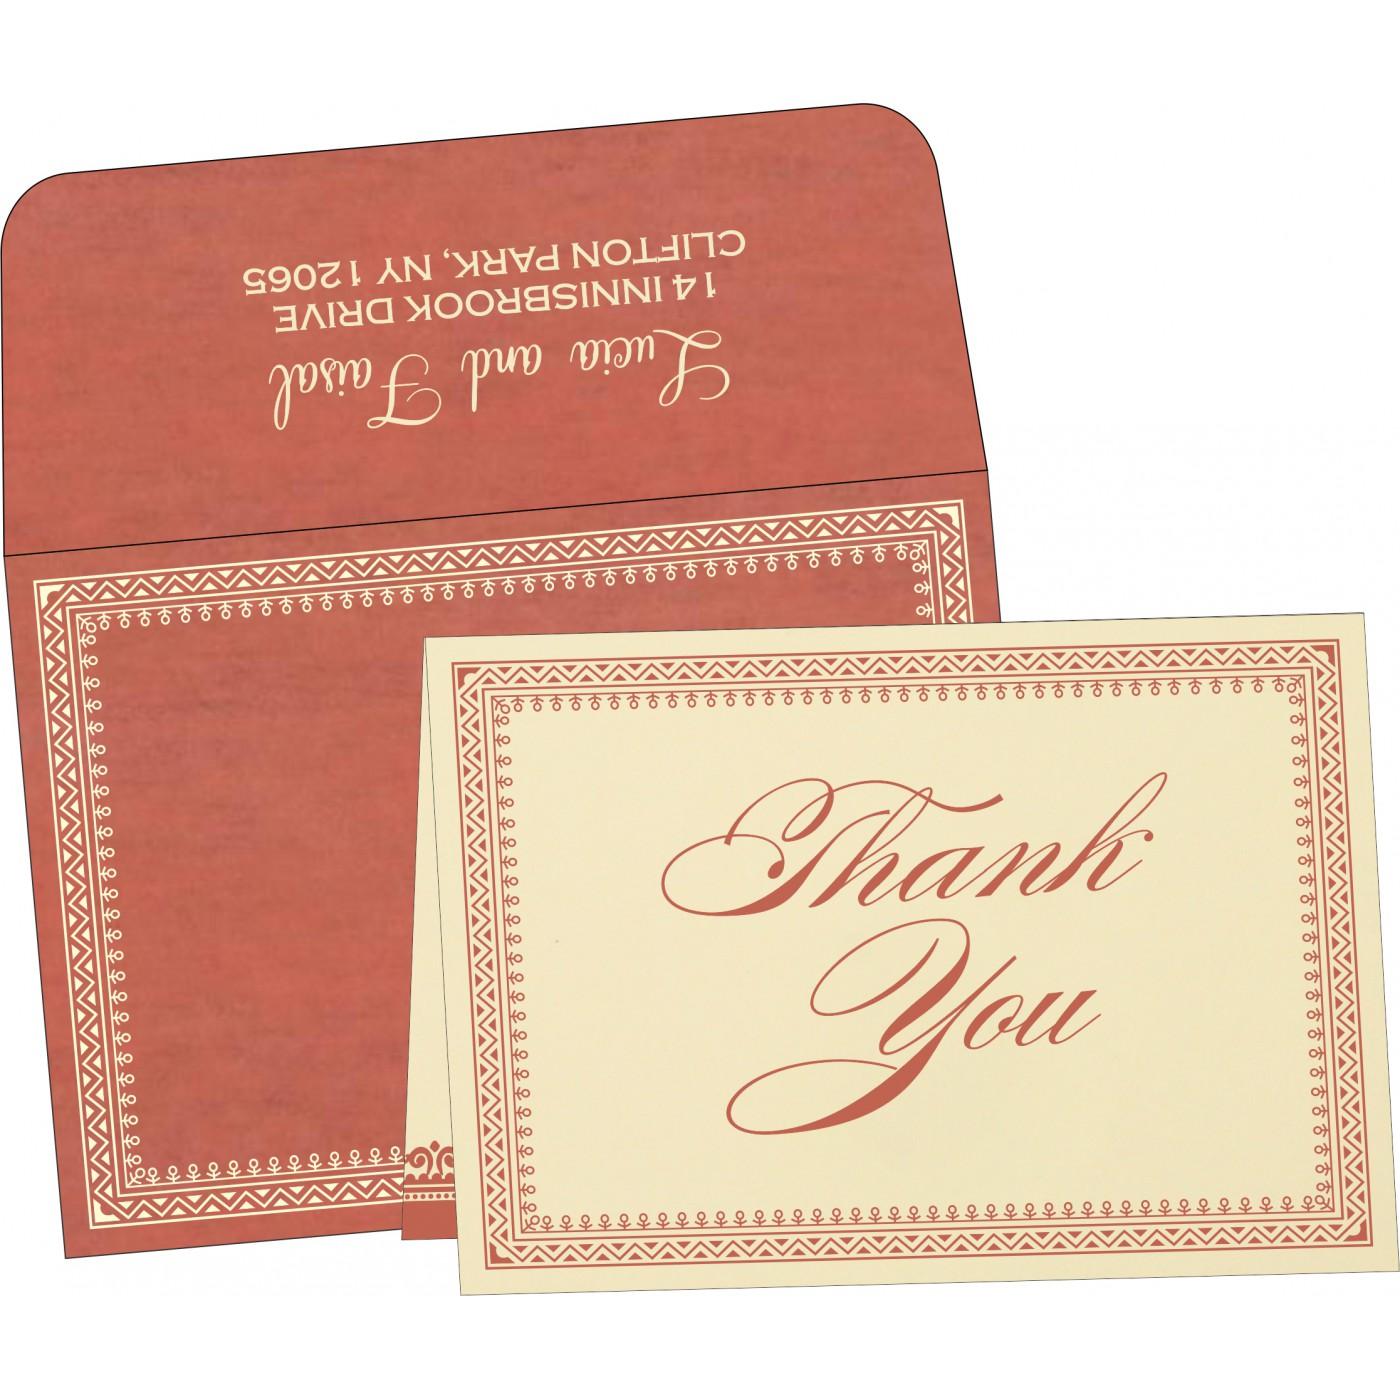 Thank You Cards : TYC-8205M - 123WeddingCards